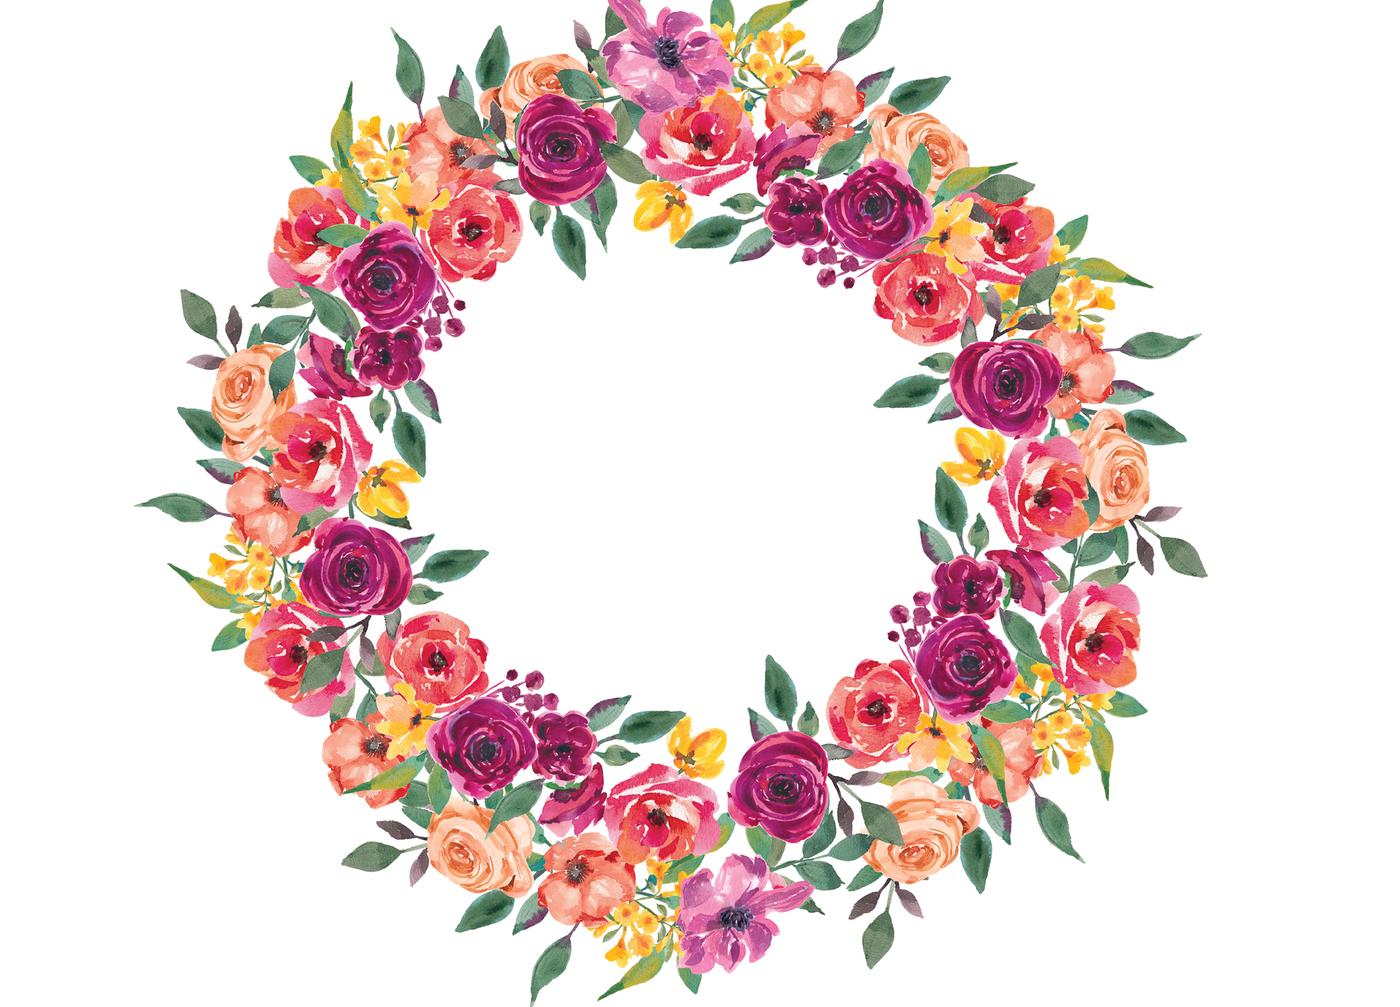 Watercolor Wreath Clipart at GetDrawings.com.